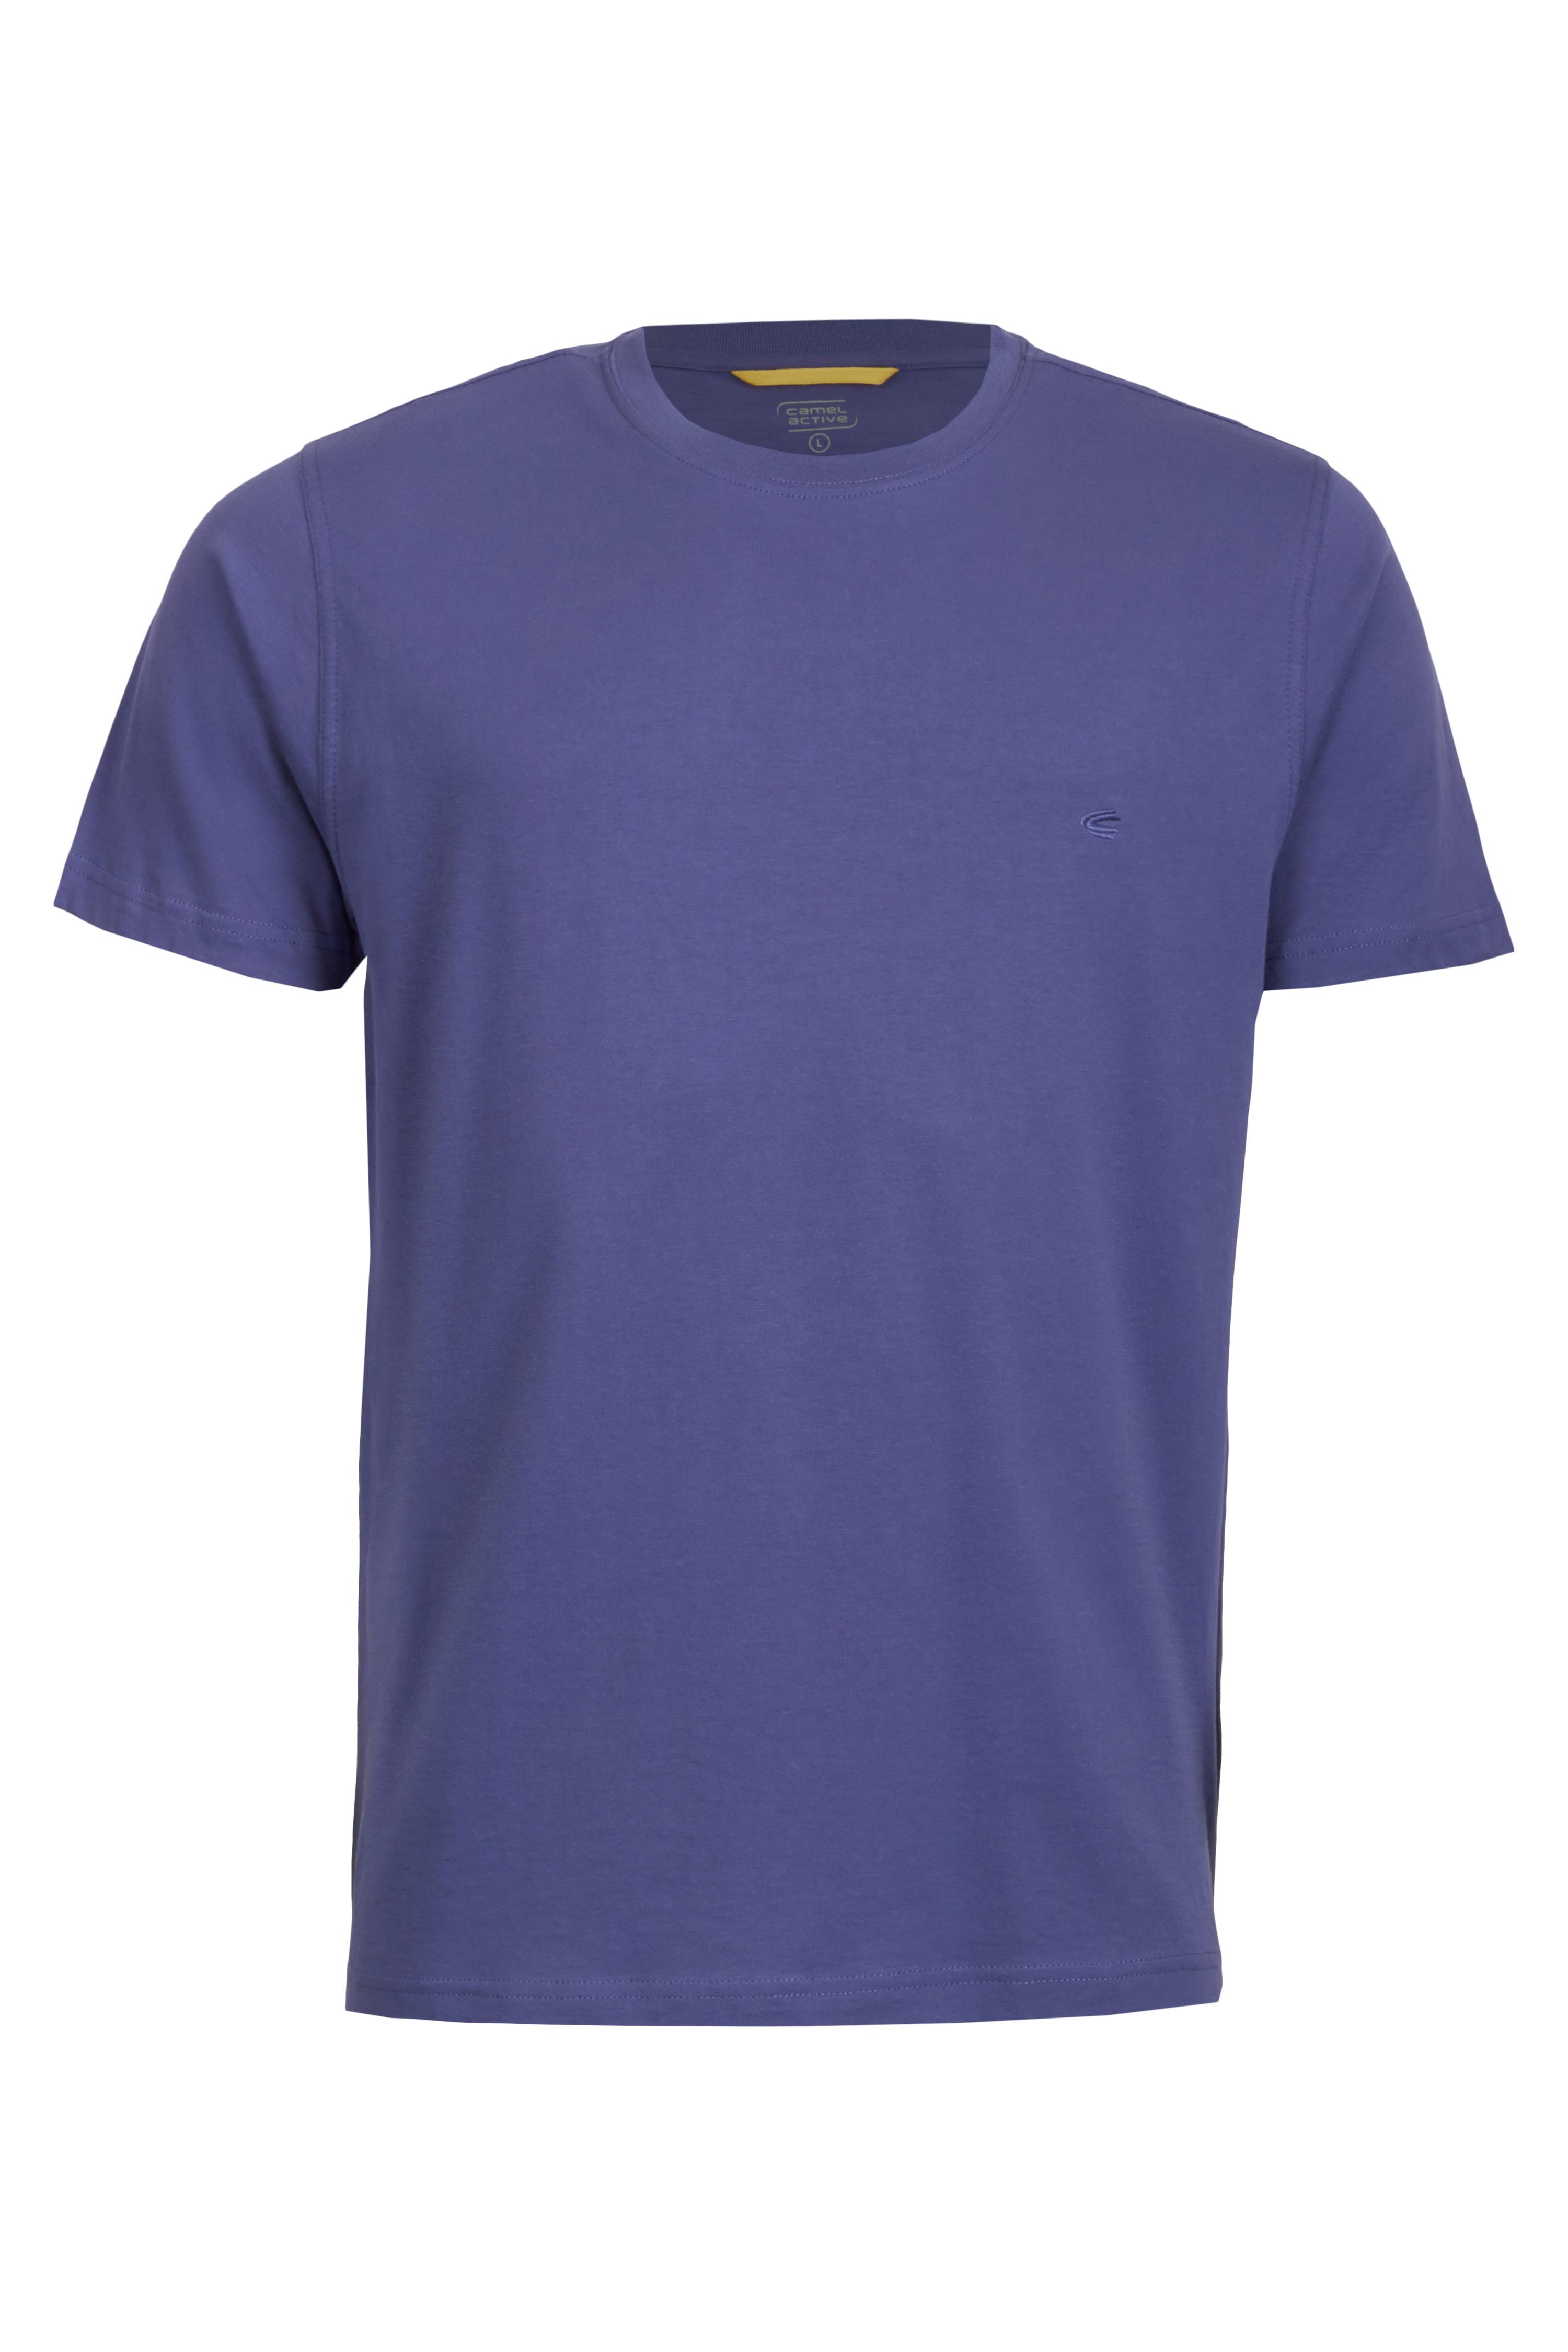 ActiveShoeWorld.de  T-Shirt mit Rundhalsausschnitt